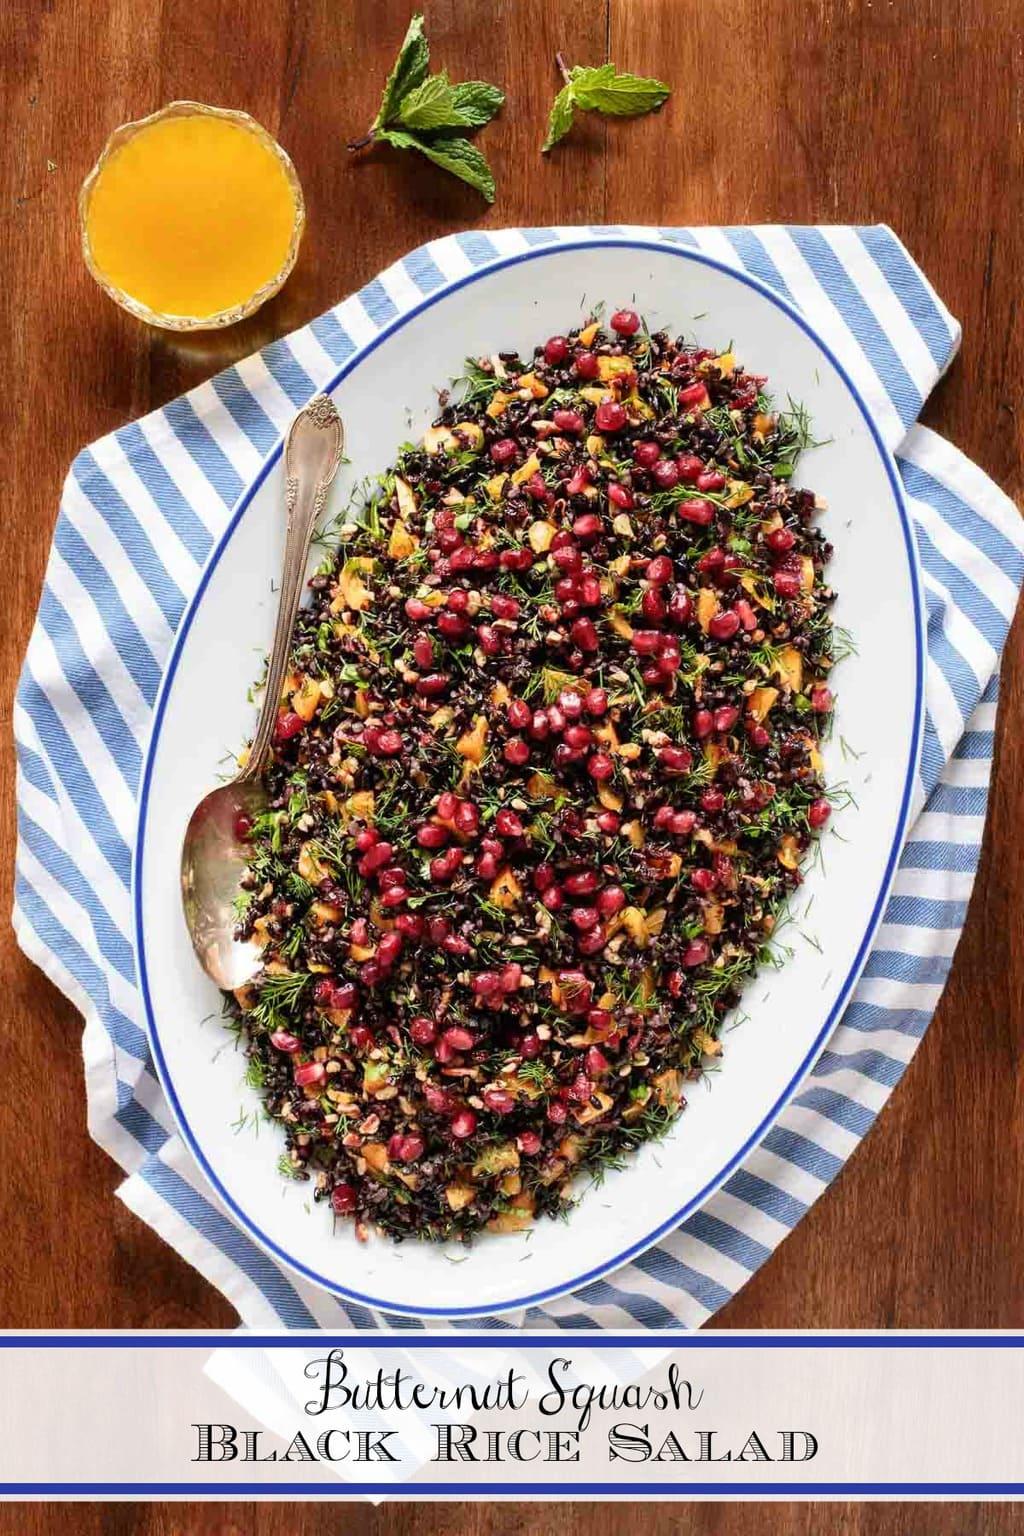 Butternut Squash Black Rice Salad